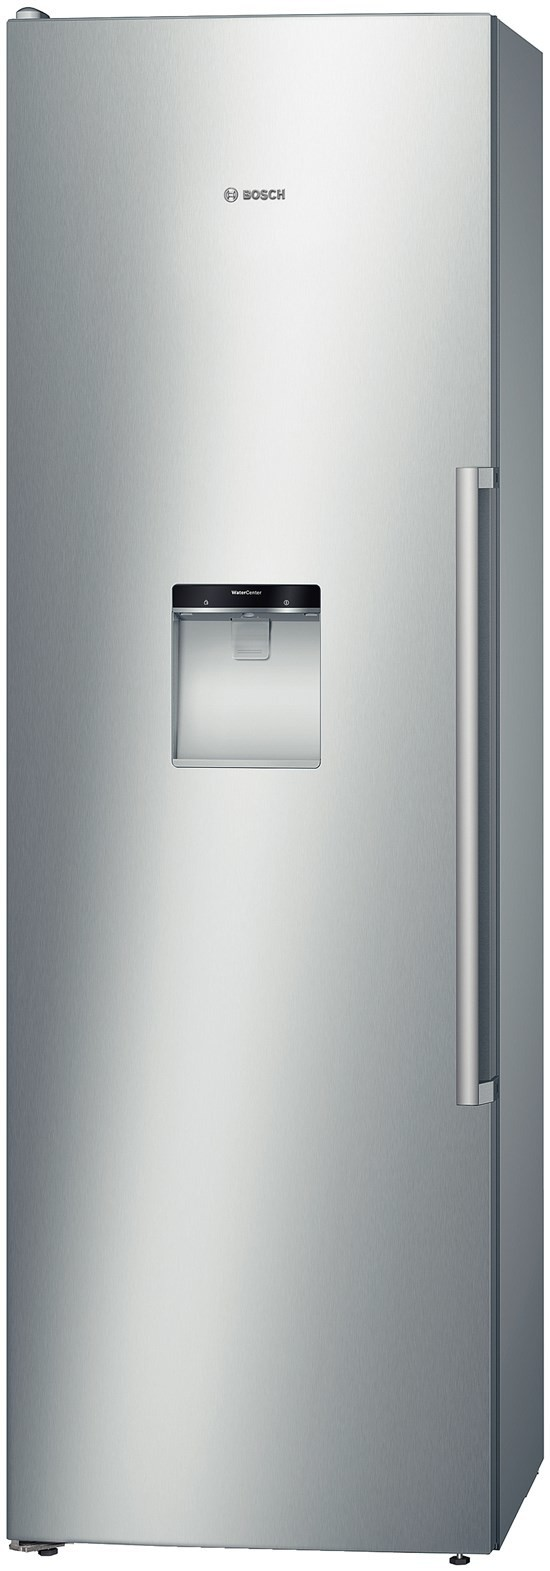 Bosch KSW36PI30 koelkast rvs